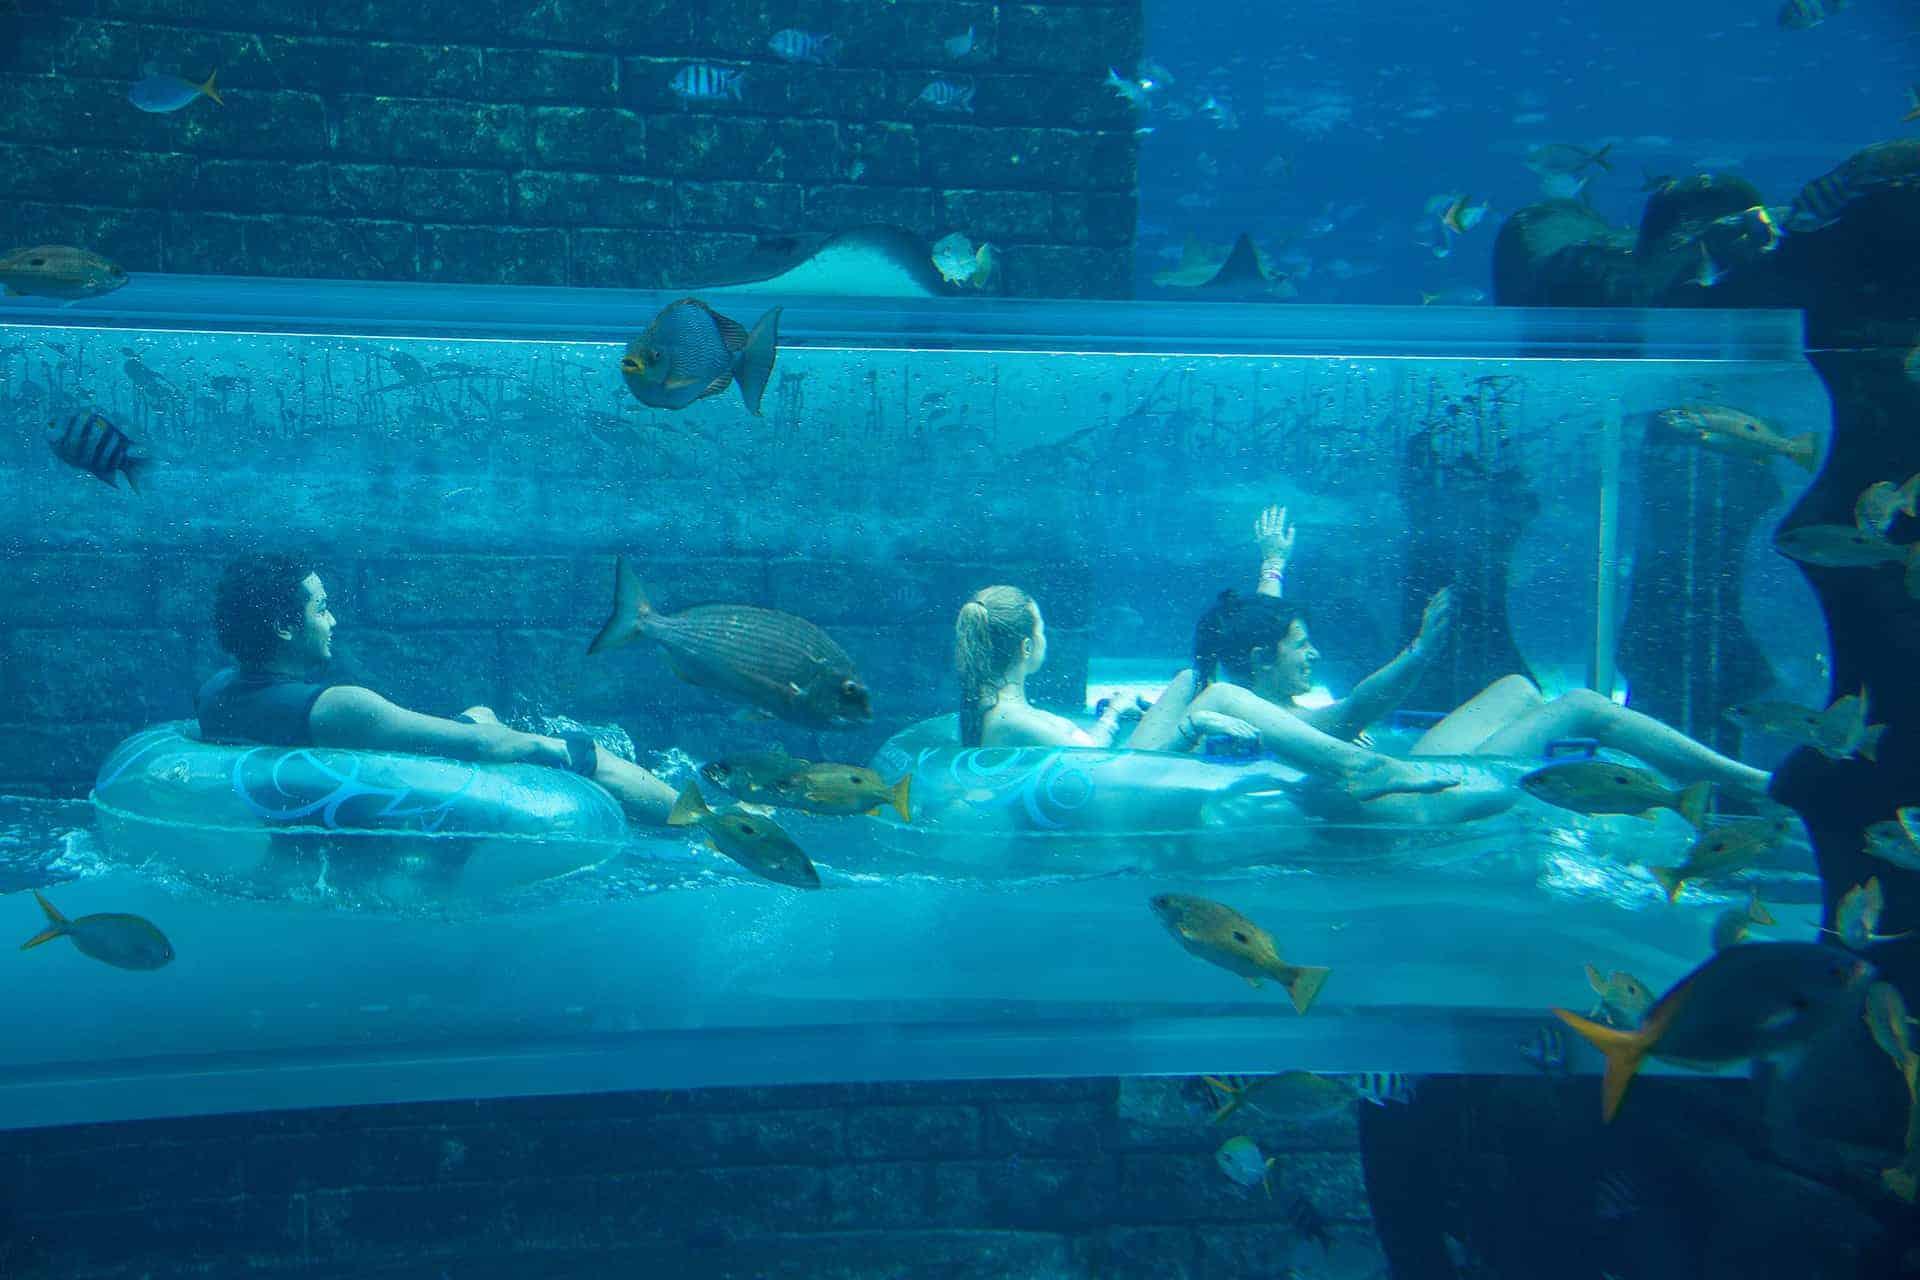 meilleur parc aquatique dubai